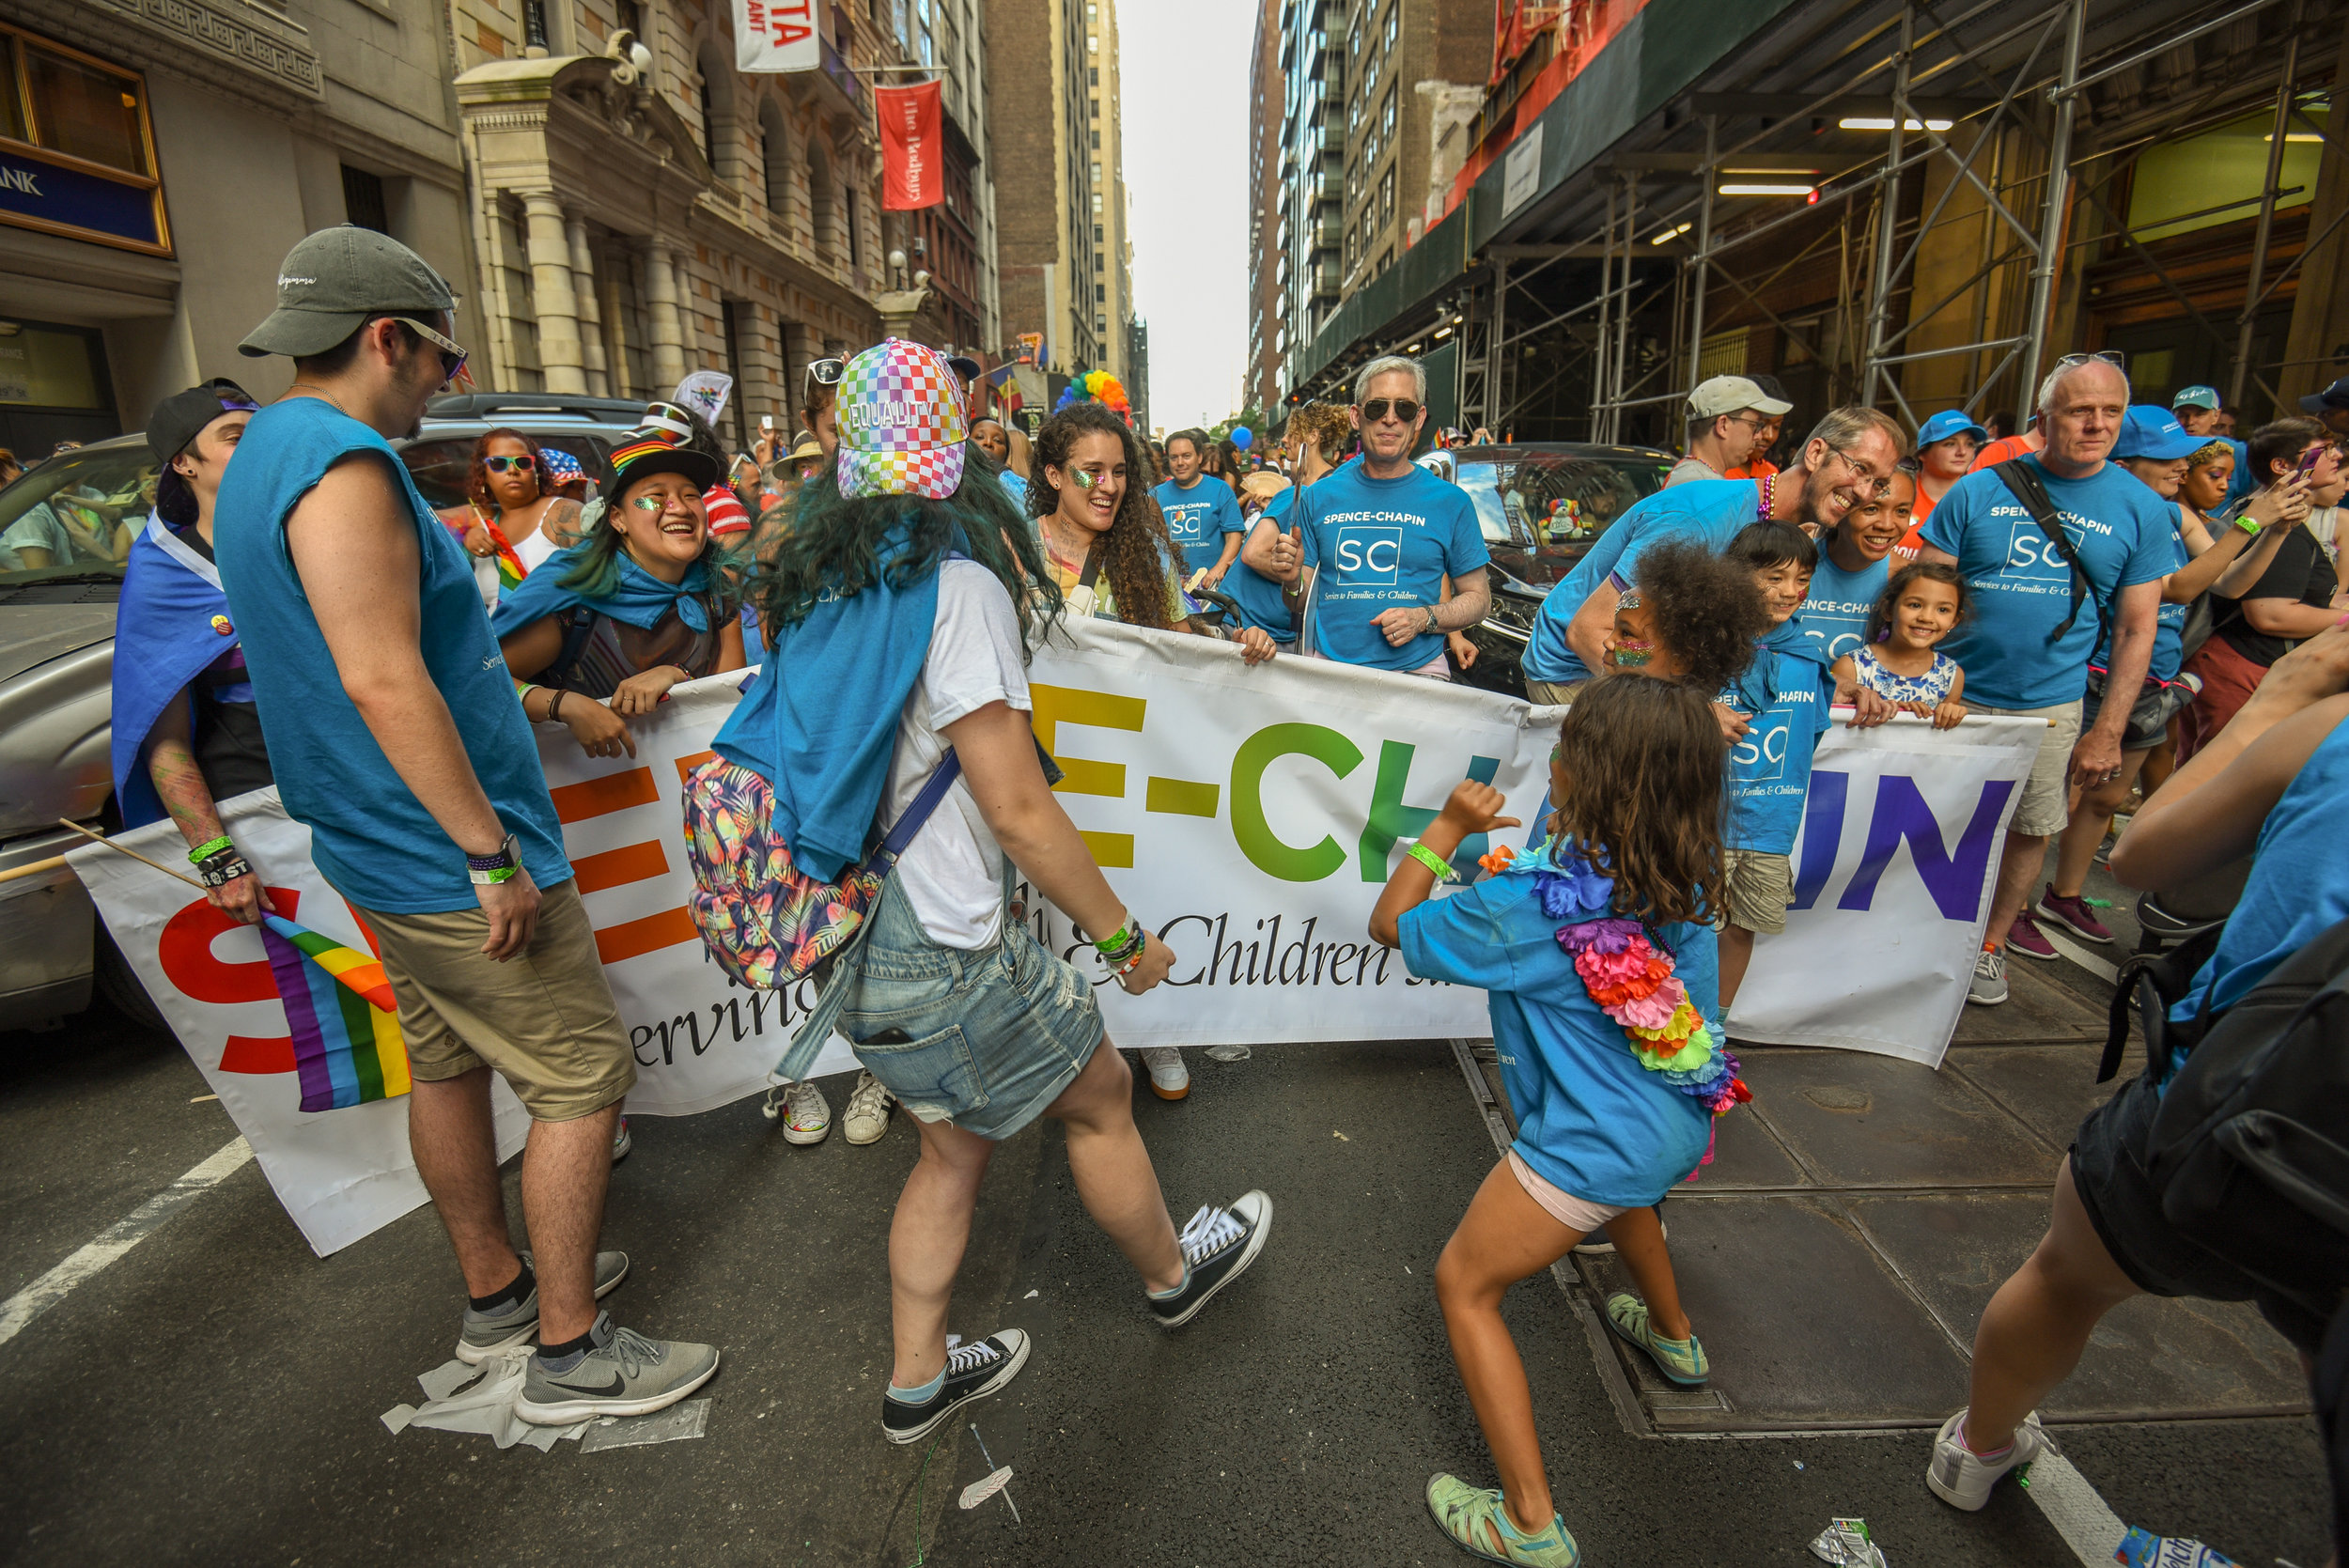 SC-PrideParade-2019_FE-183.jpg